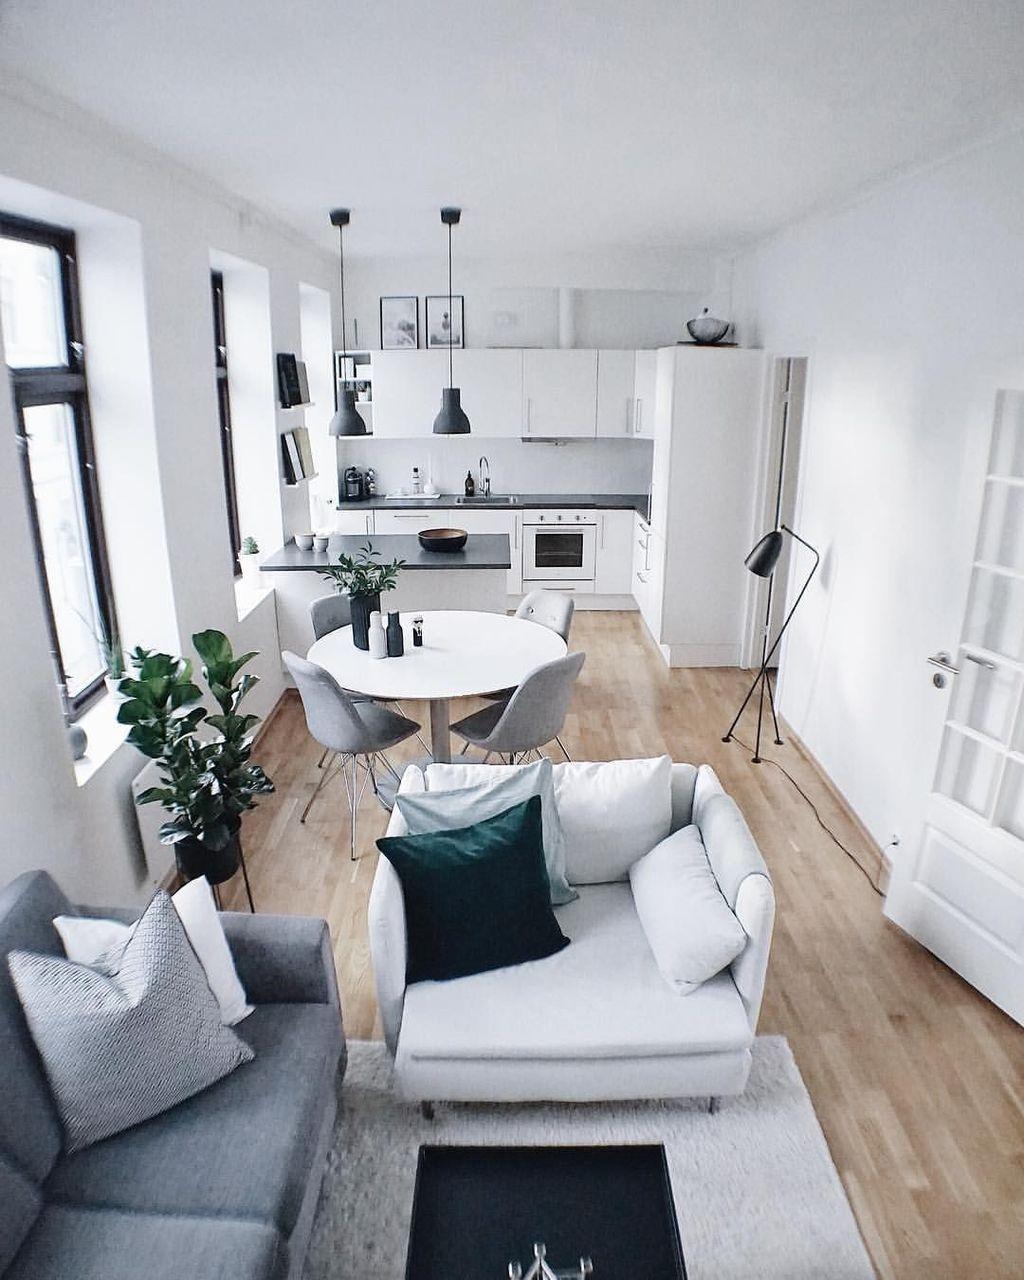 30 Outstanding Small Apartment Interior Design Ideas In 2020